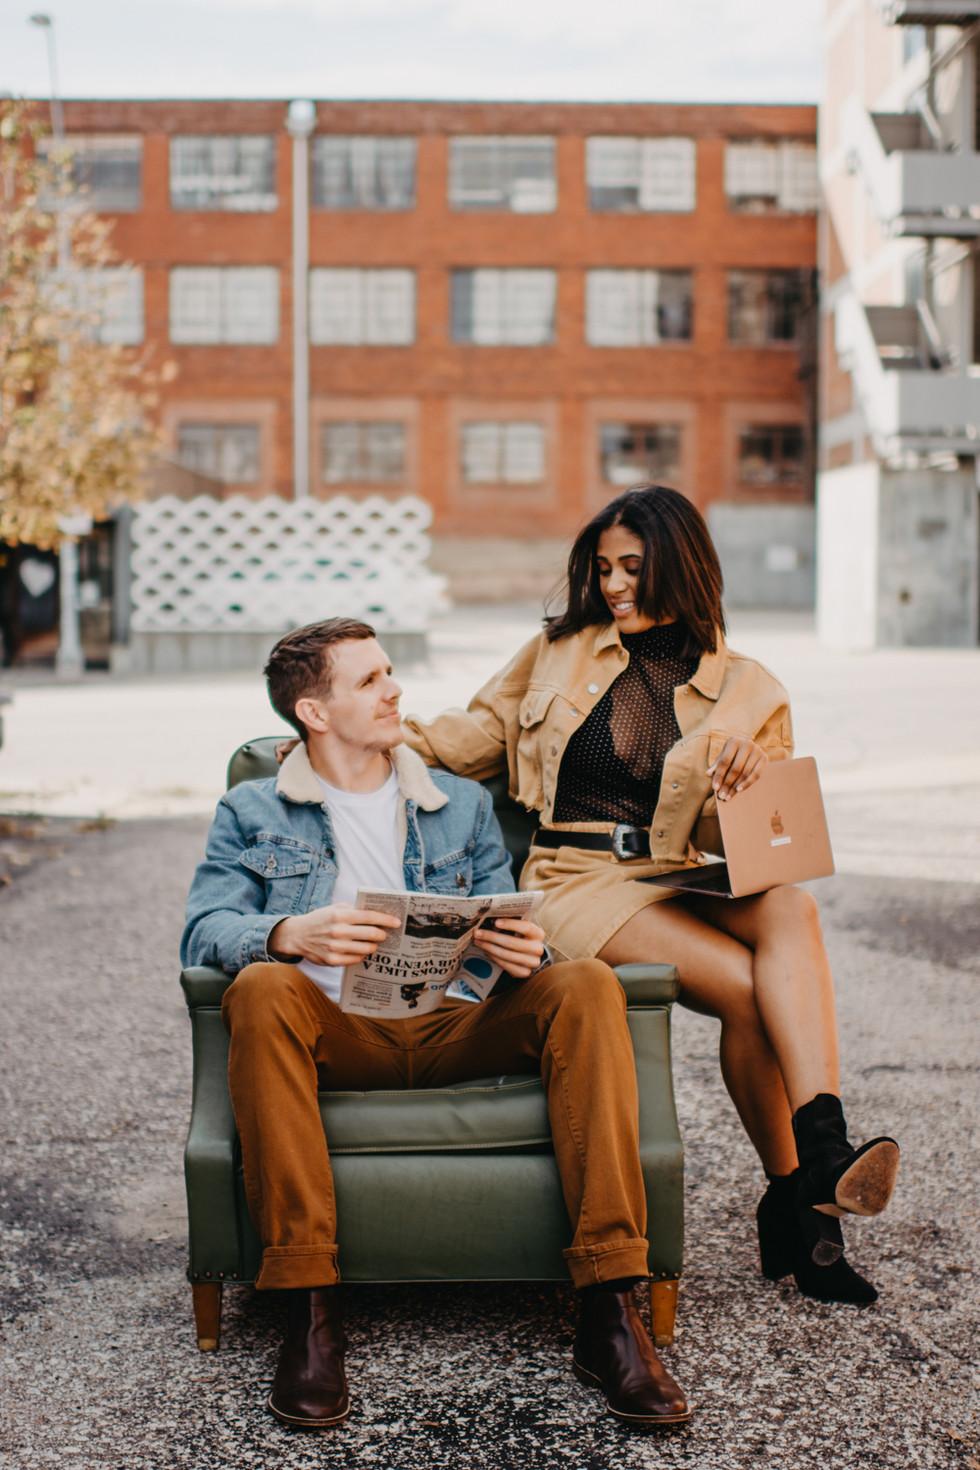 JeffersonMayPhotography_Couples-23.jpg